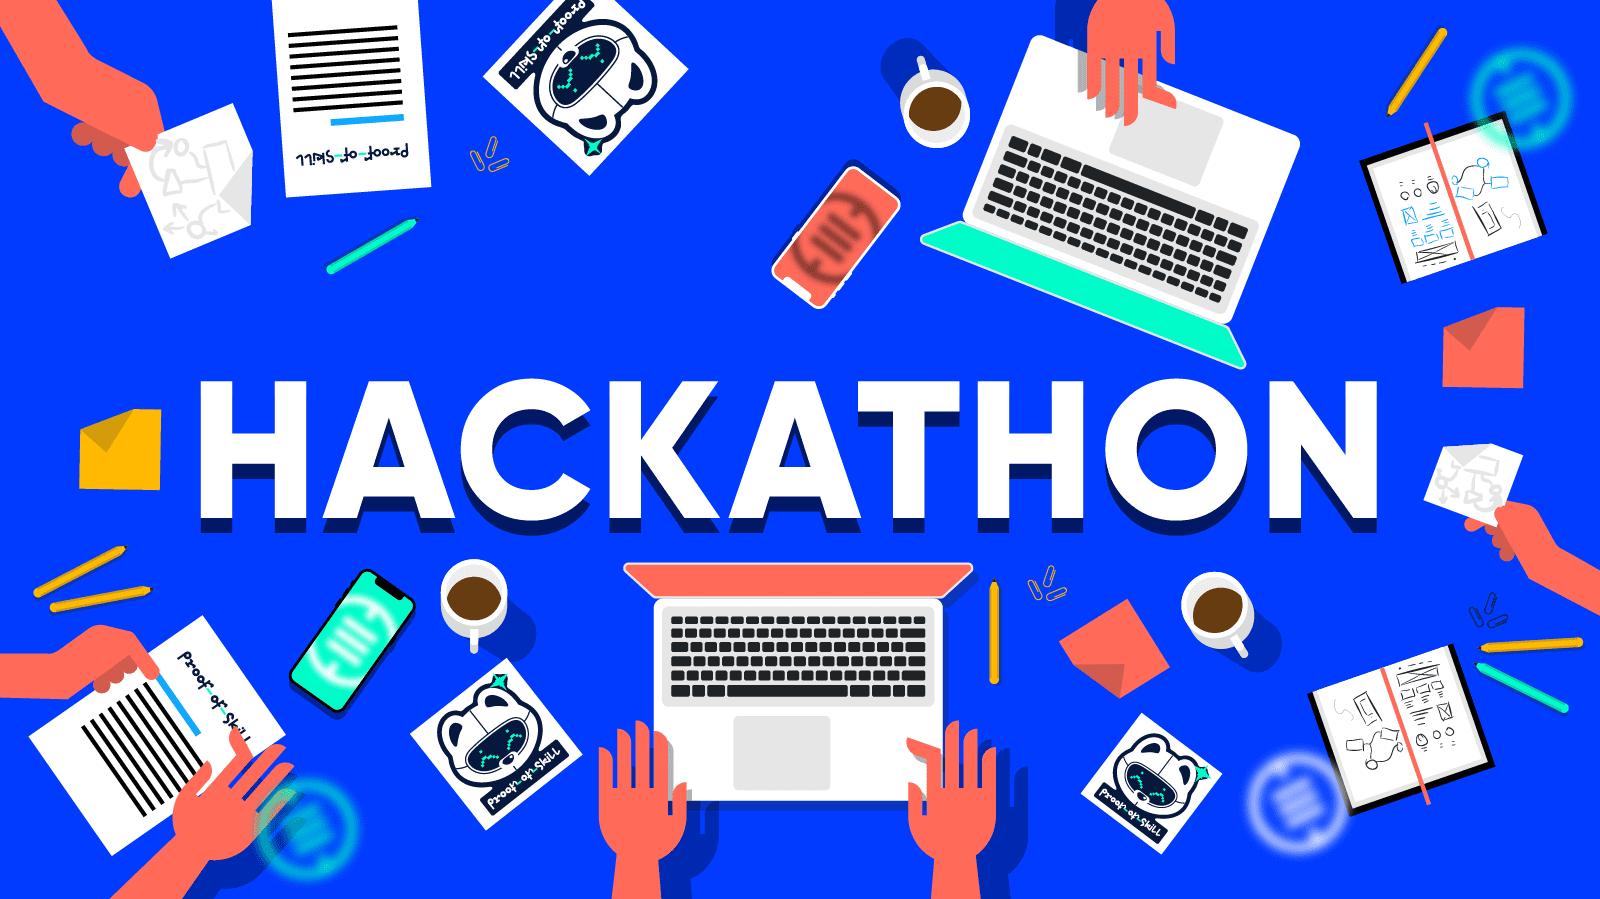 TSIC hackathon from Sept 28